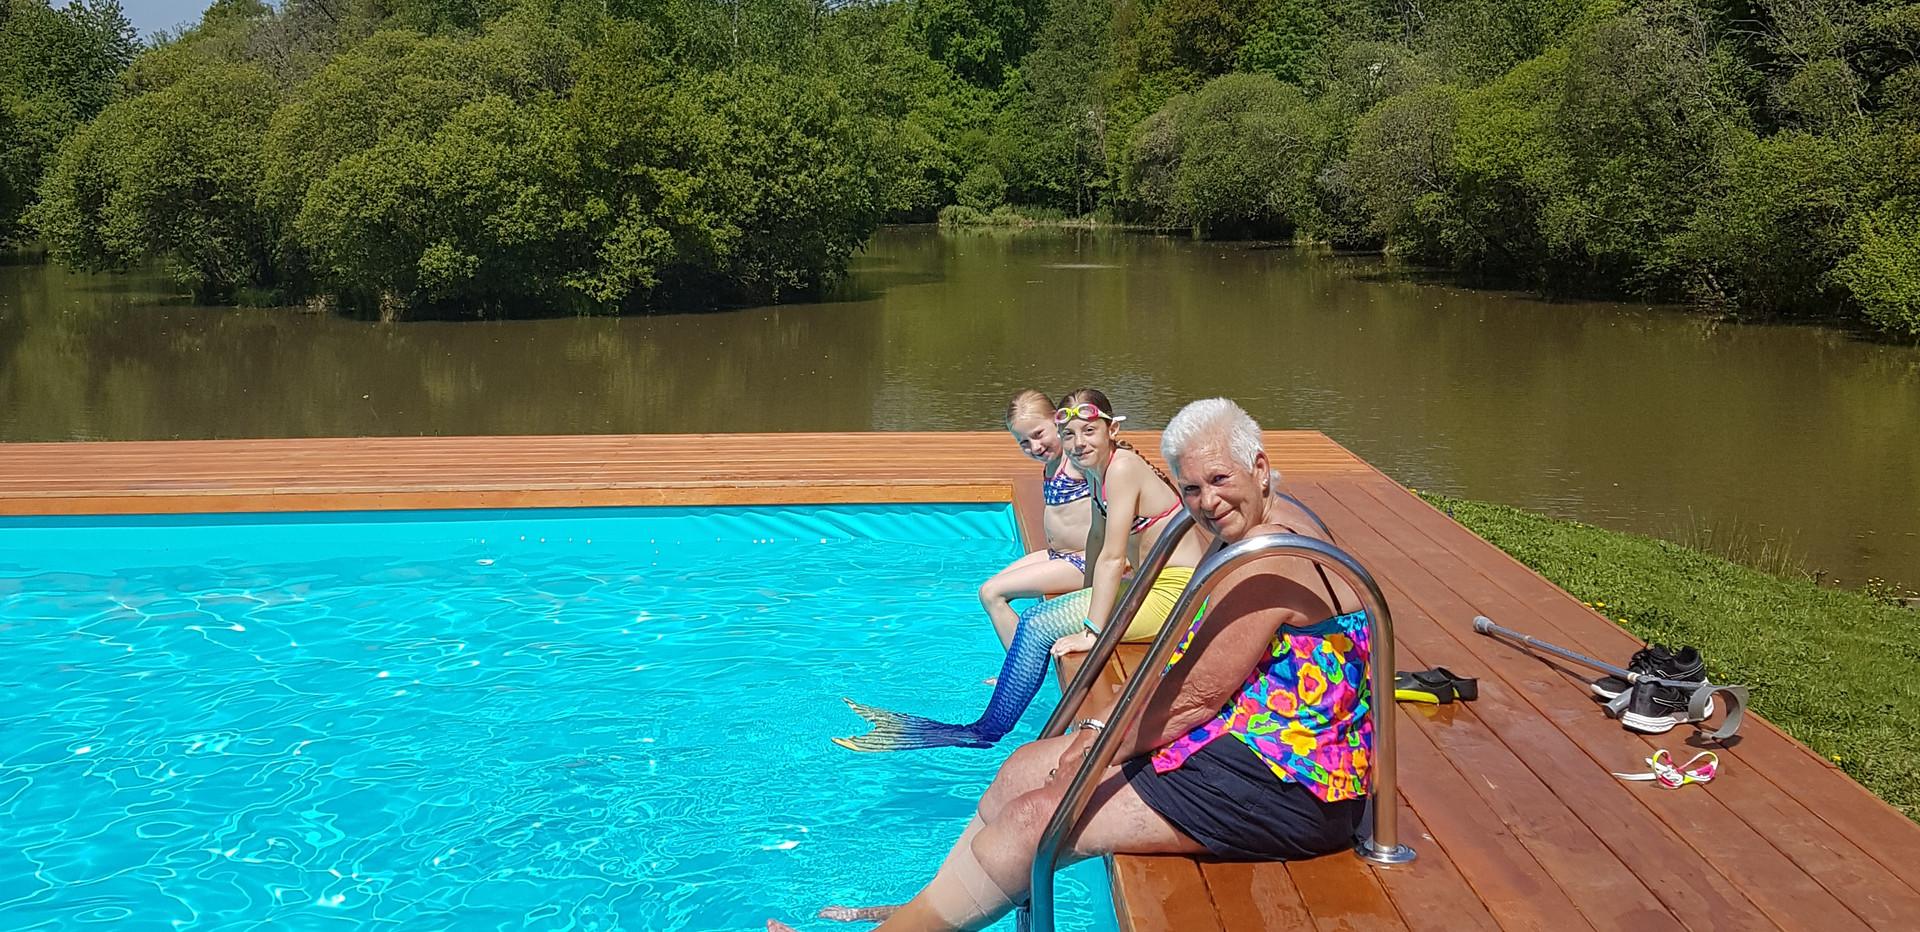 Les Gravelles Pool and Lake